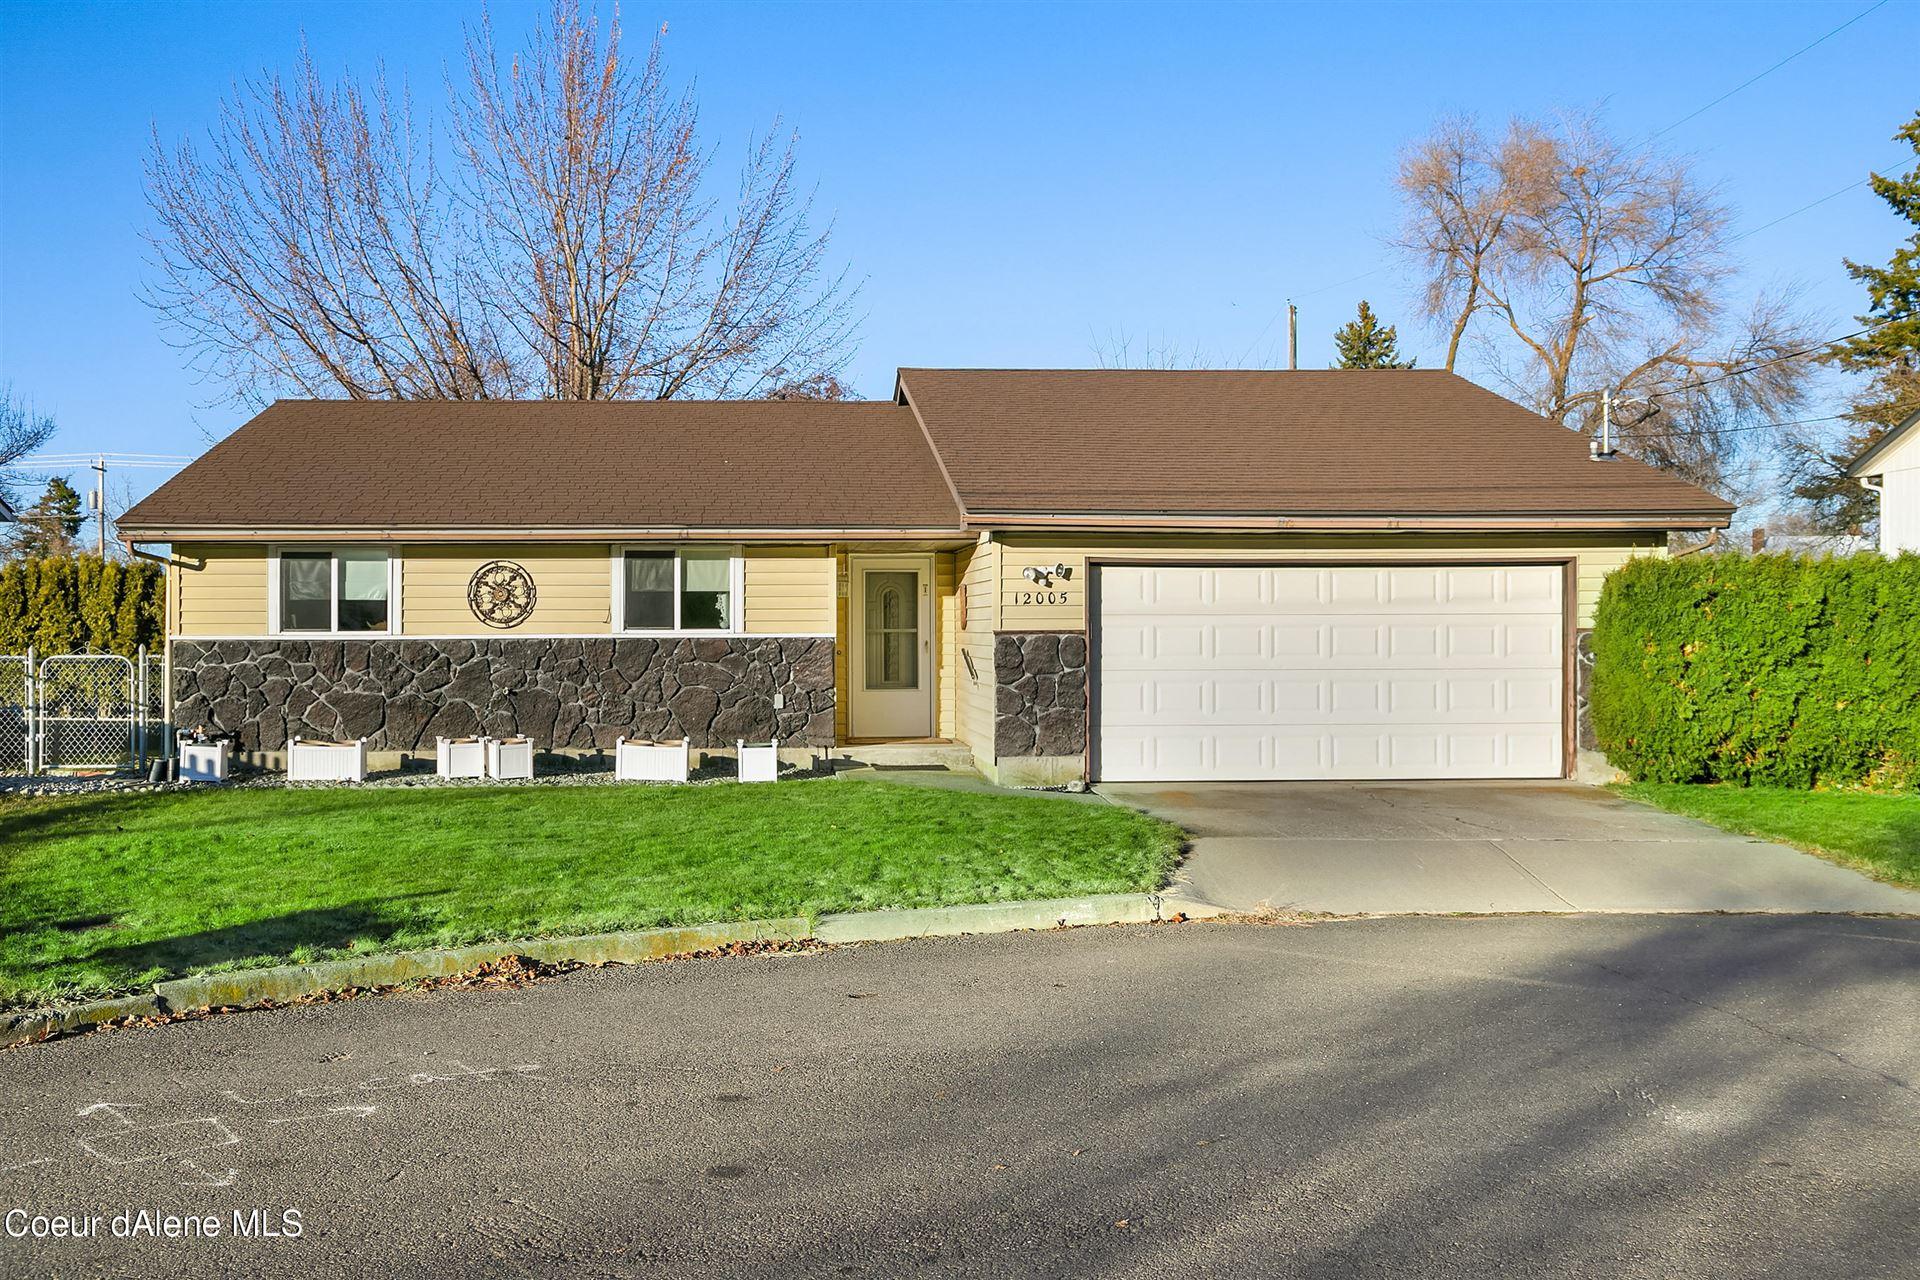 Photo of 12005 E 5th Ave, Spokane Valley, WA 99206 (MLS # 21-341)